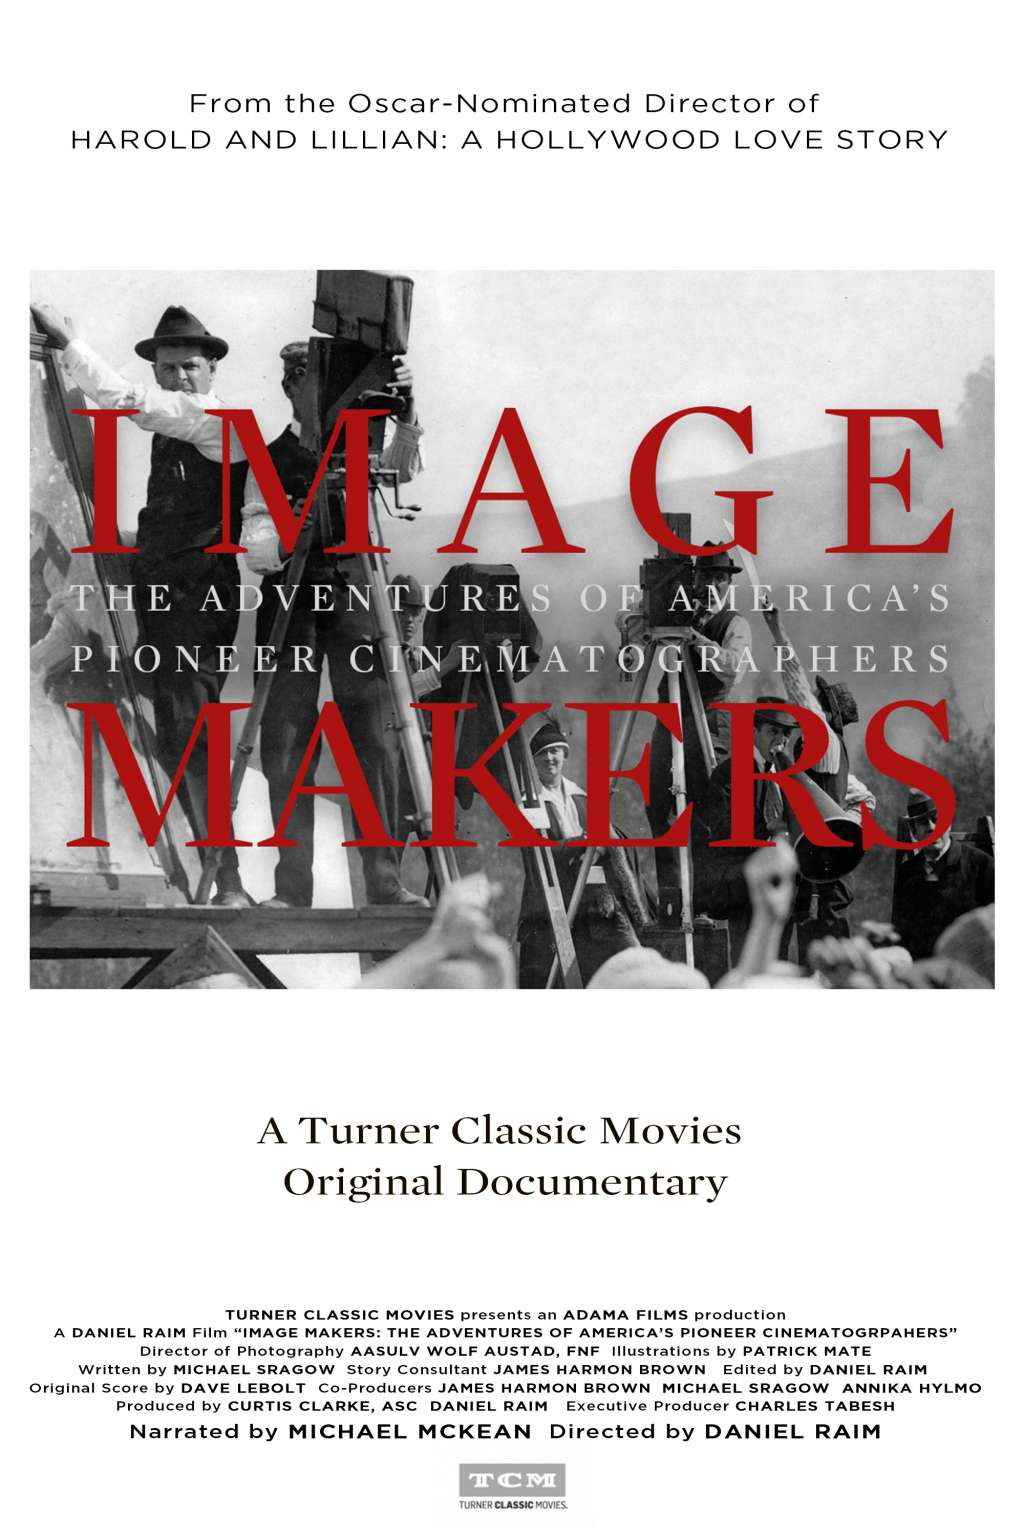 Image Makers: The Adventures of America's Pioneer Cinematographers kapak